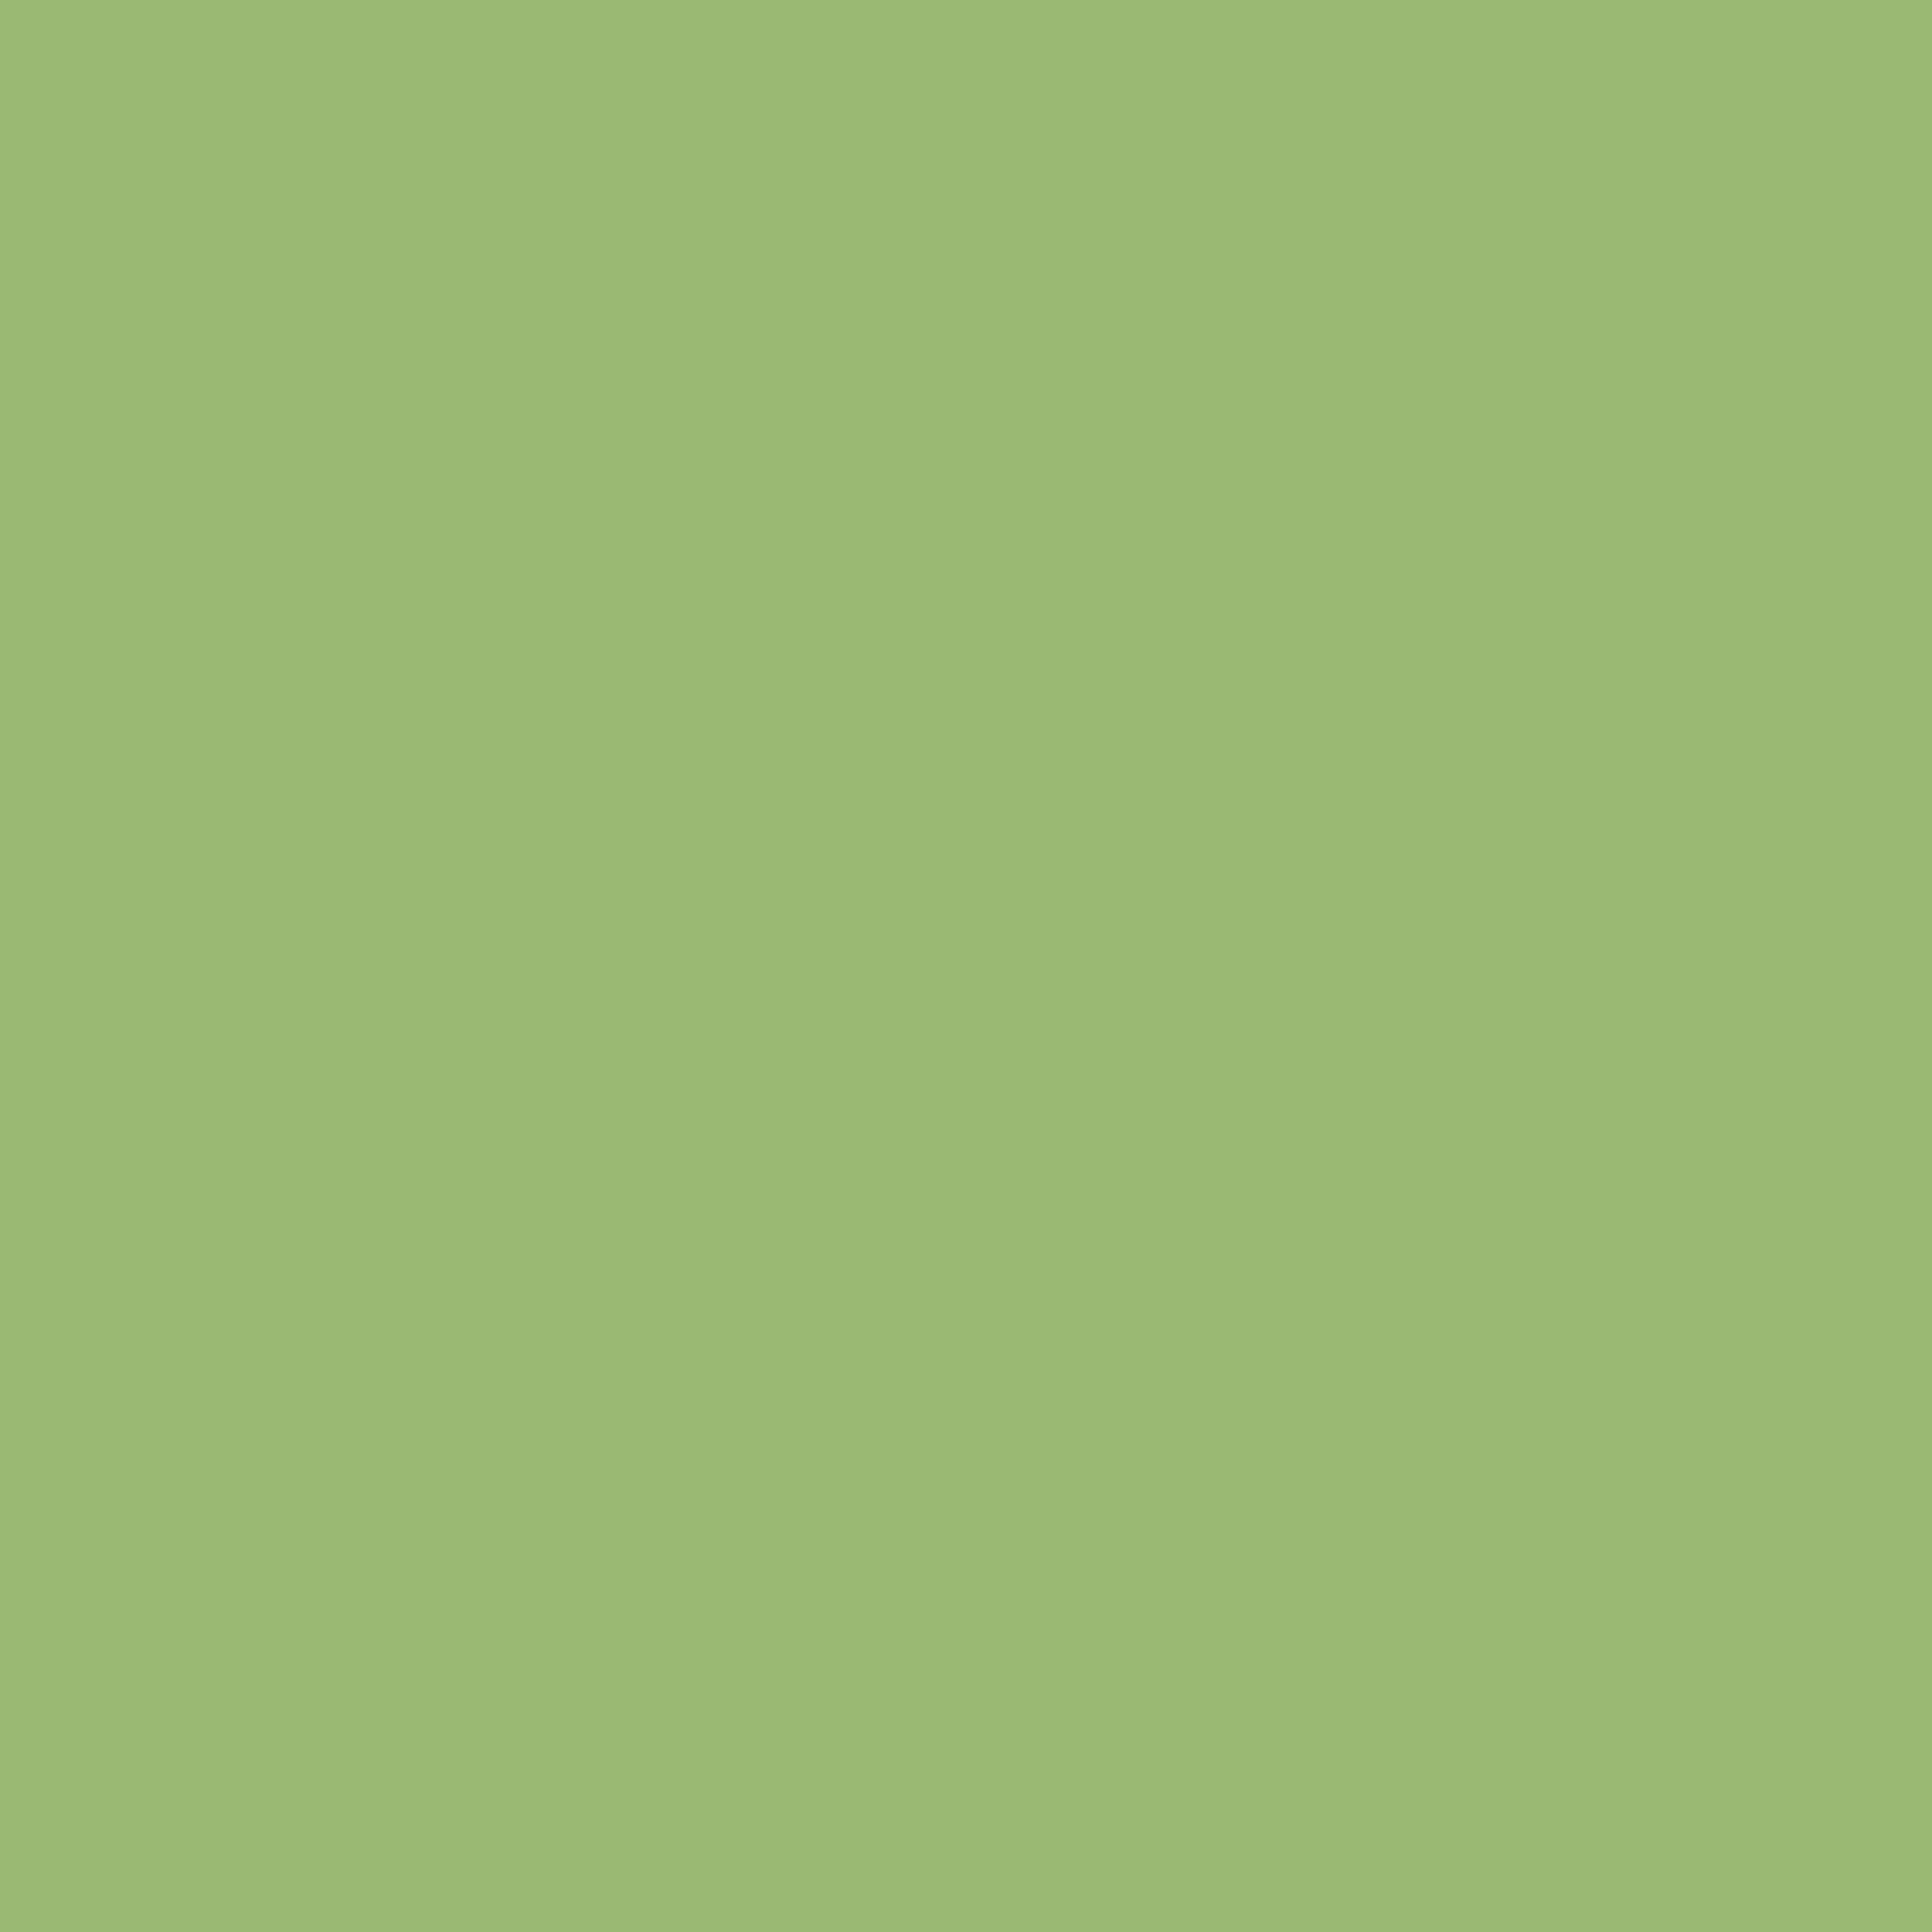 2732x2732 Olivine Solid Color Background